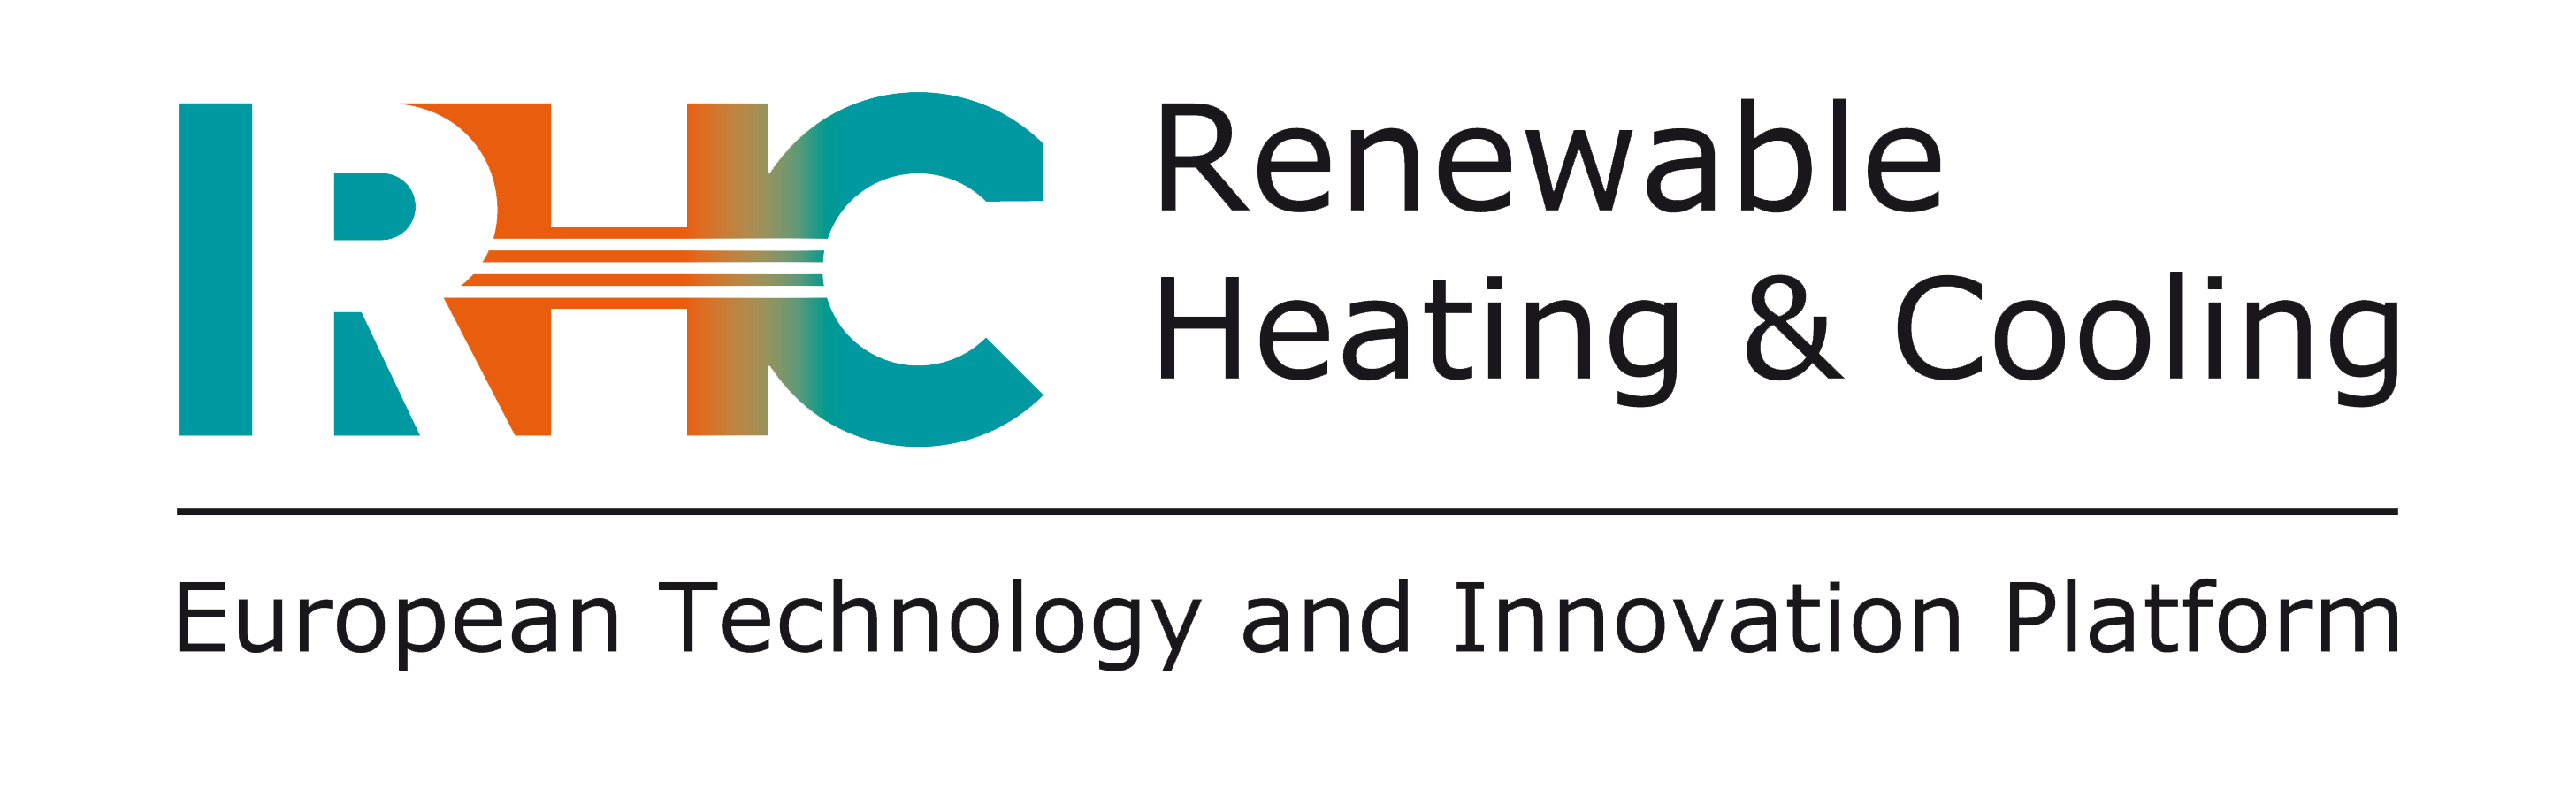 RHC_Logo_rgb 2016 v2 copy